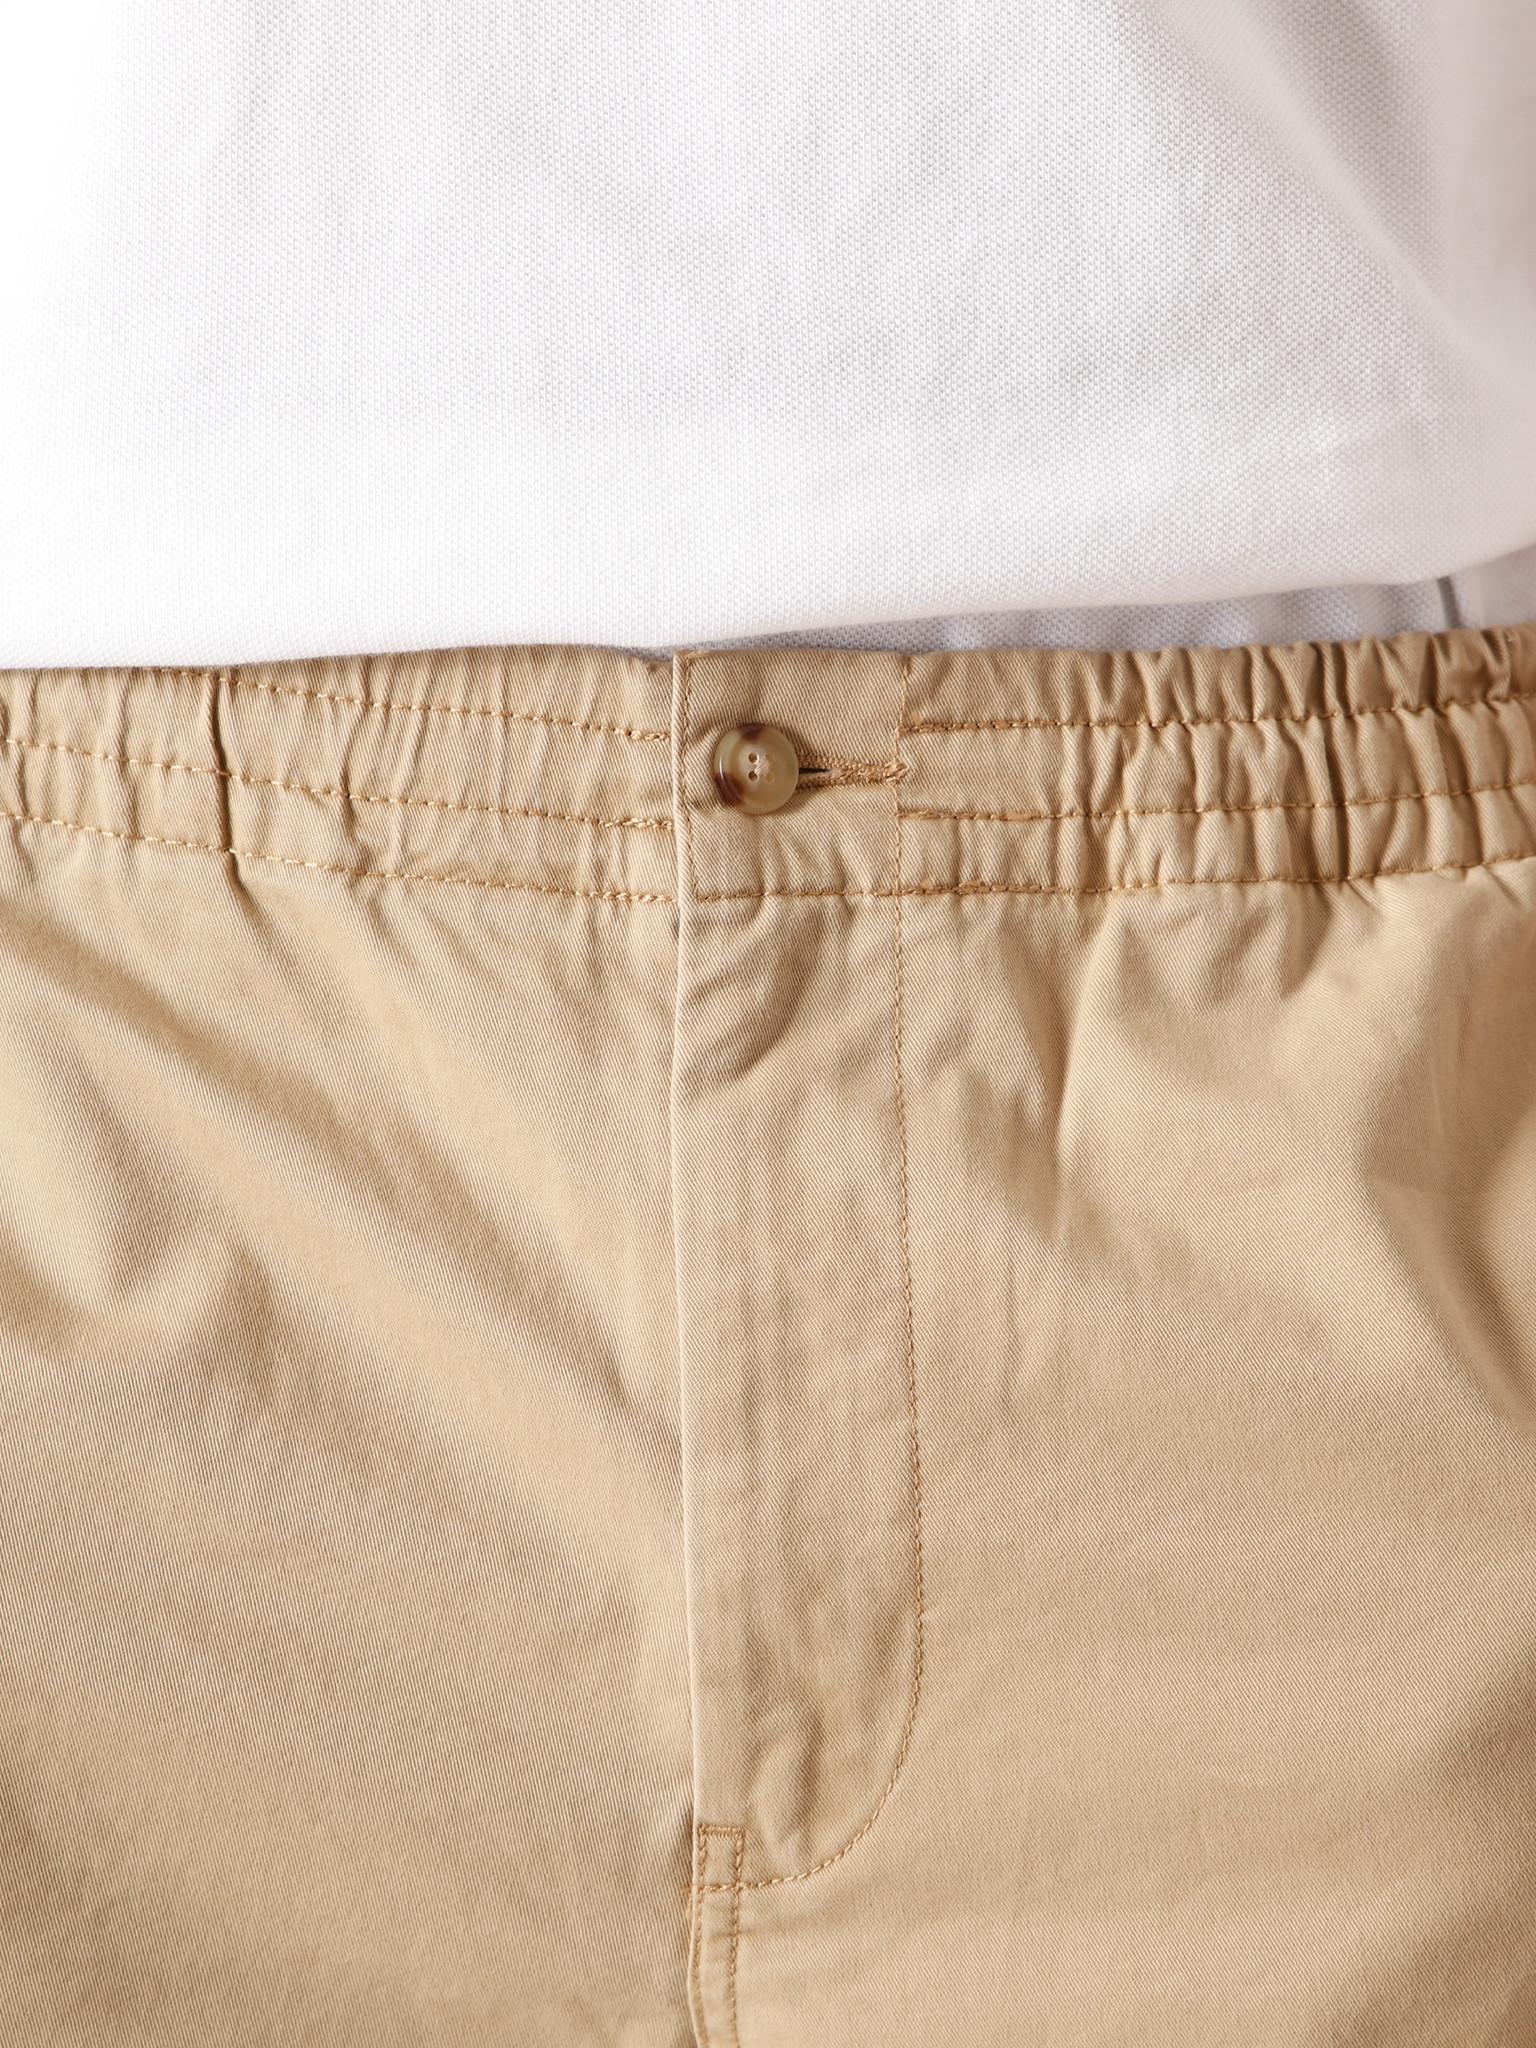 Polo Ralph Lauren Polo Ralph Lauren Classic Fit Prepster Short Luxury Tan 710644995028